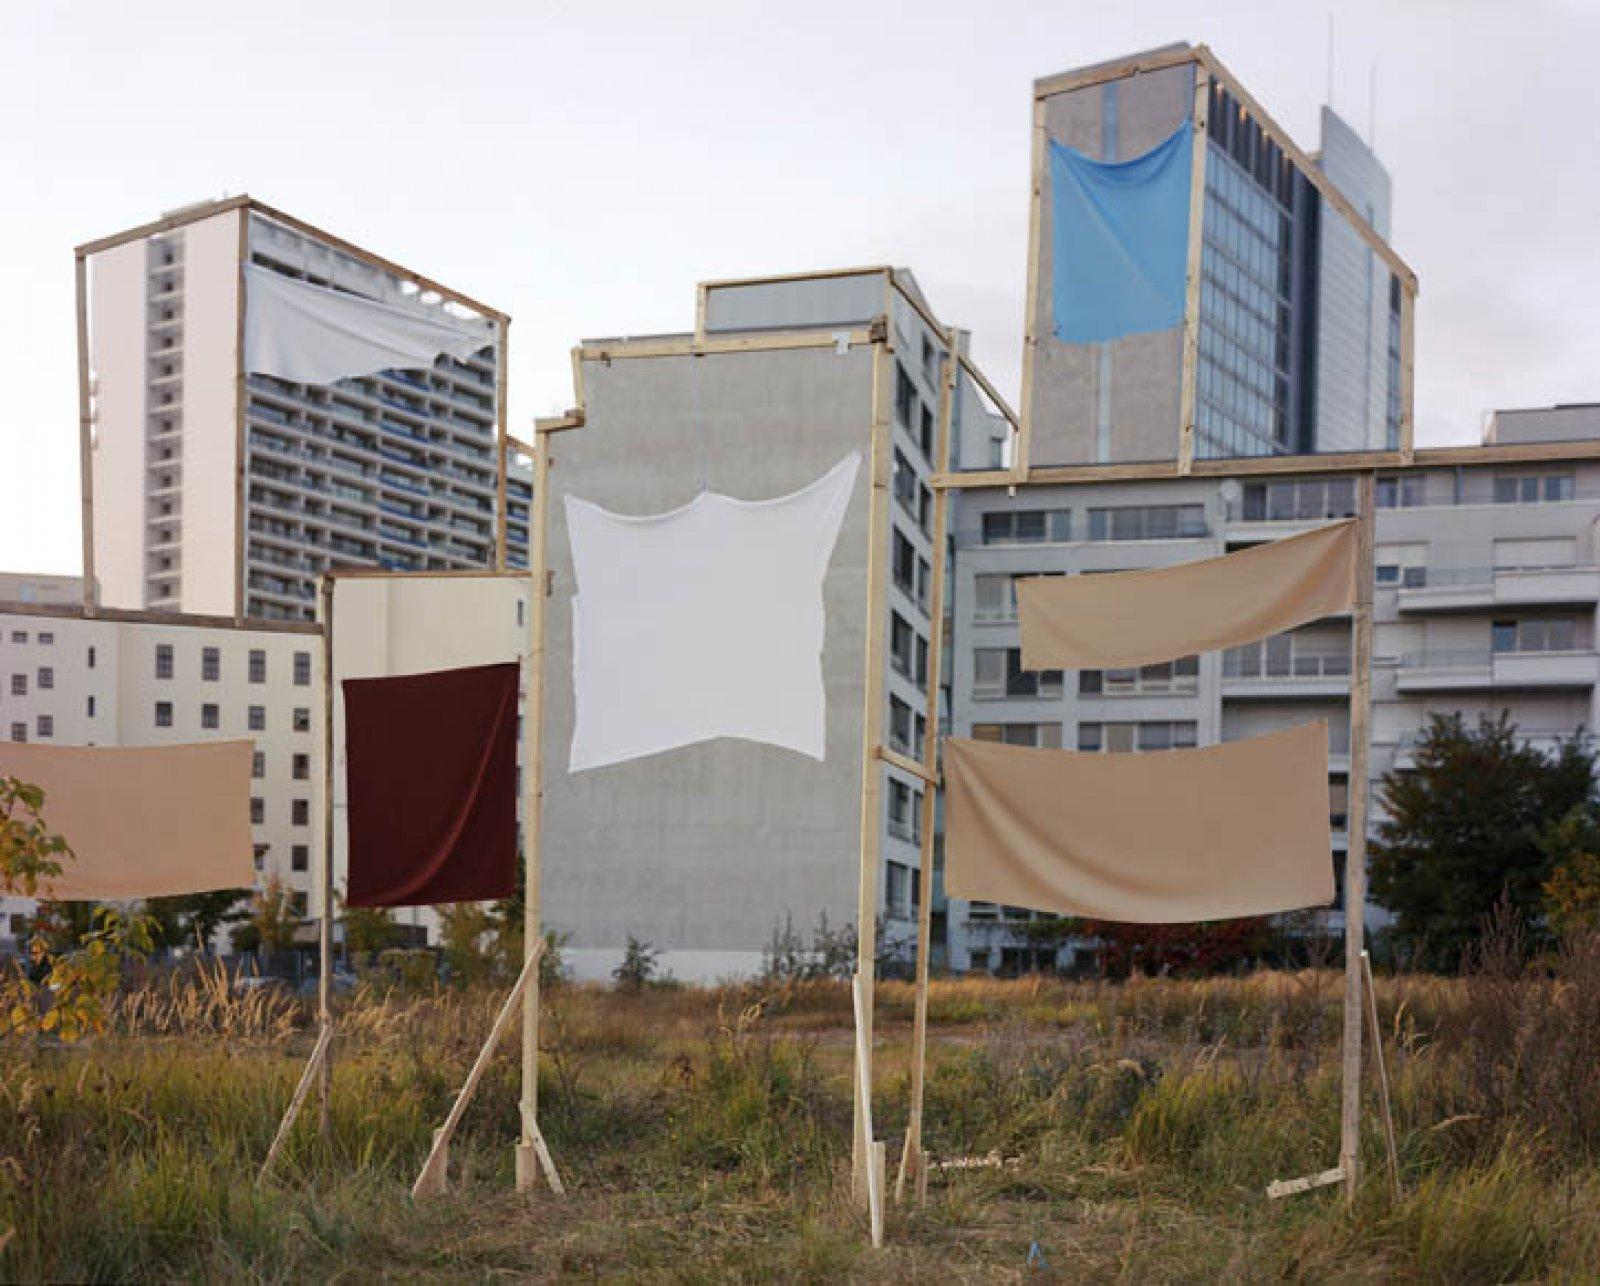 Banners, 2009 © Taiyo Onorato & Nico Krebs / courtesy RaebervonStenglin, Zurich & Peter Lav Gallery, Kopenhagen